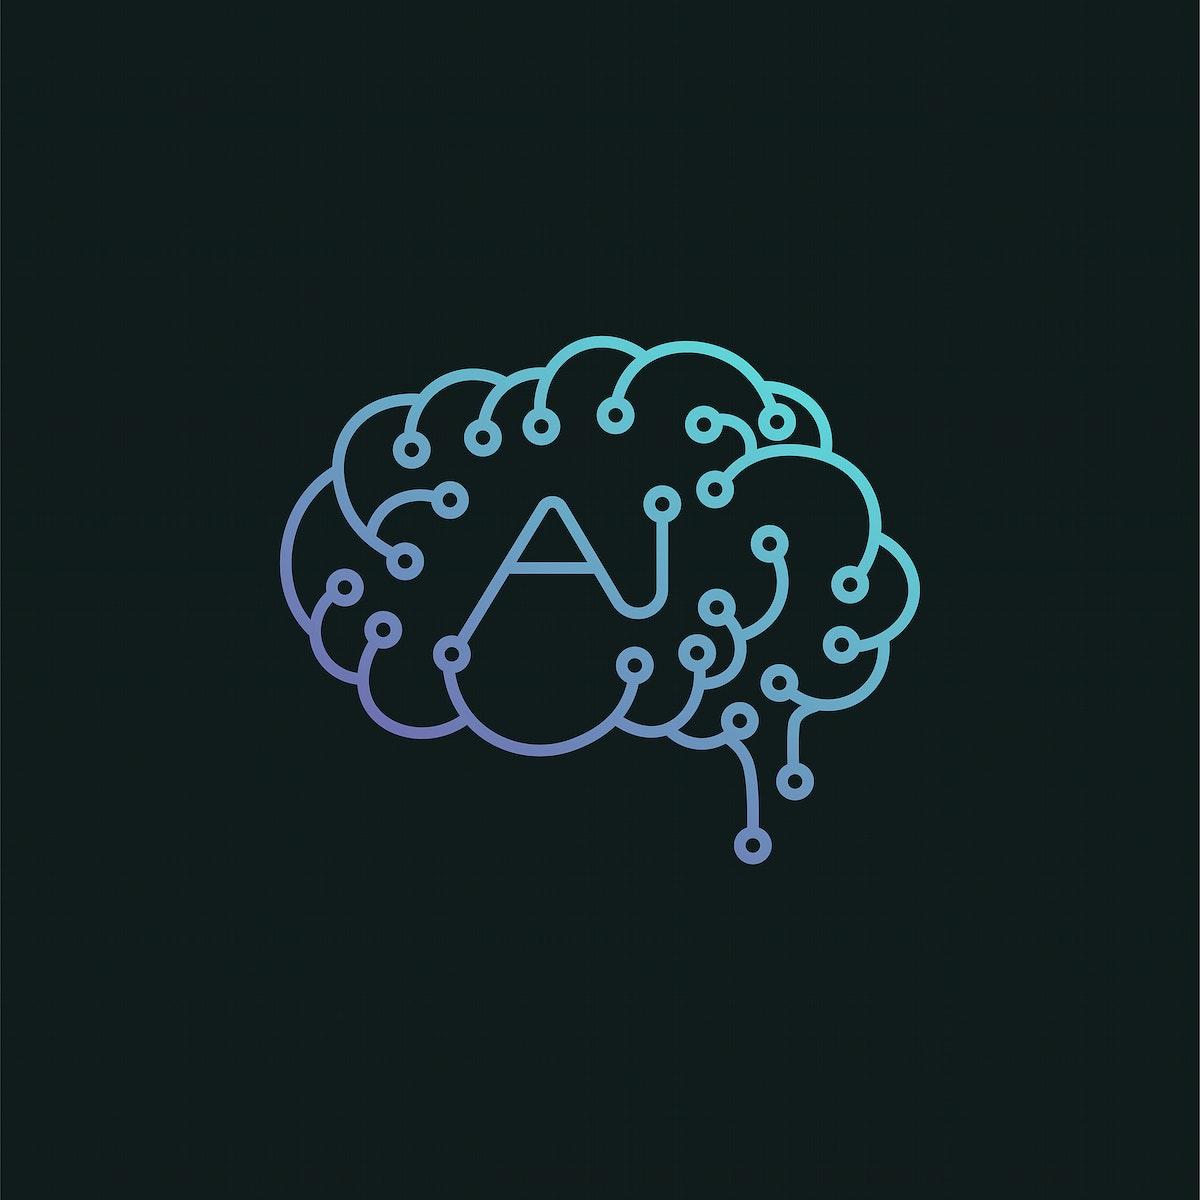 Artificial intelligence brain icon illustration